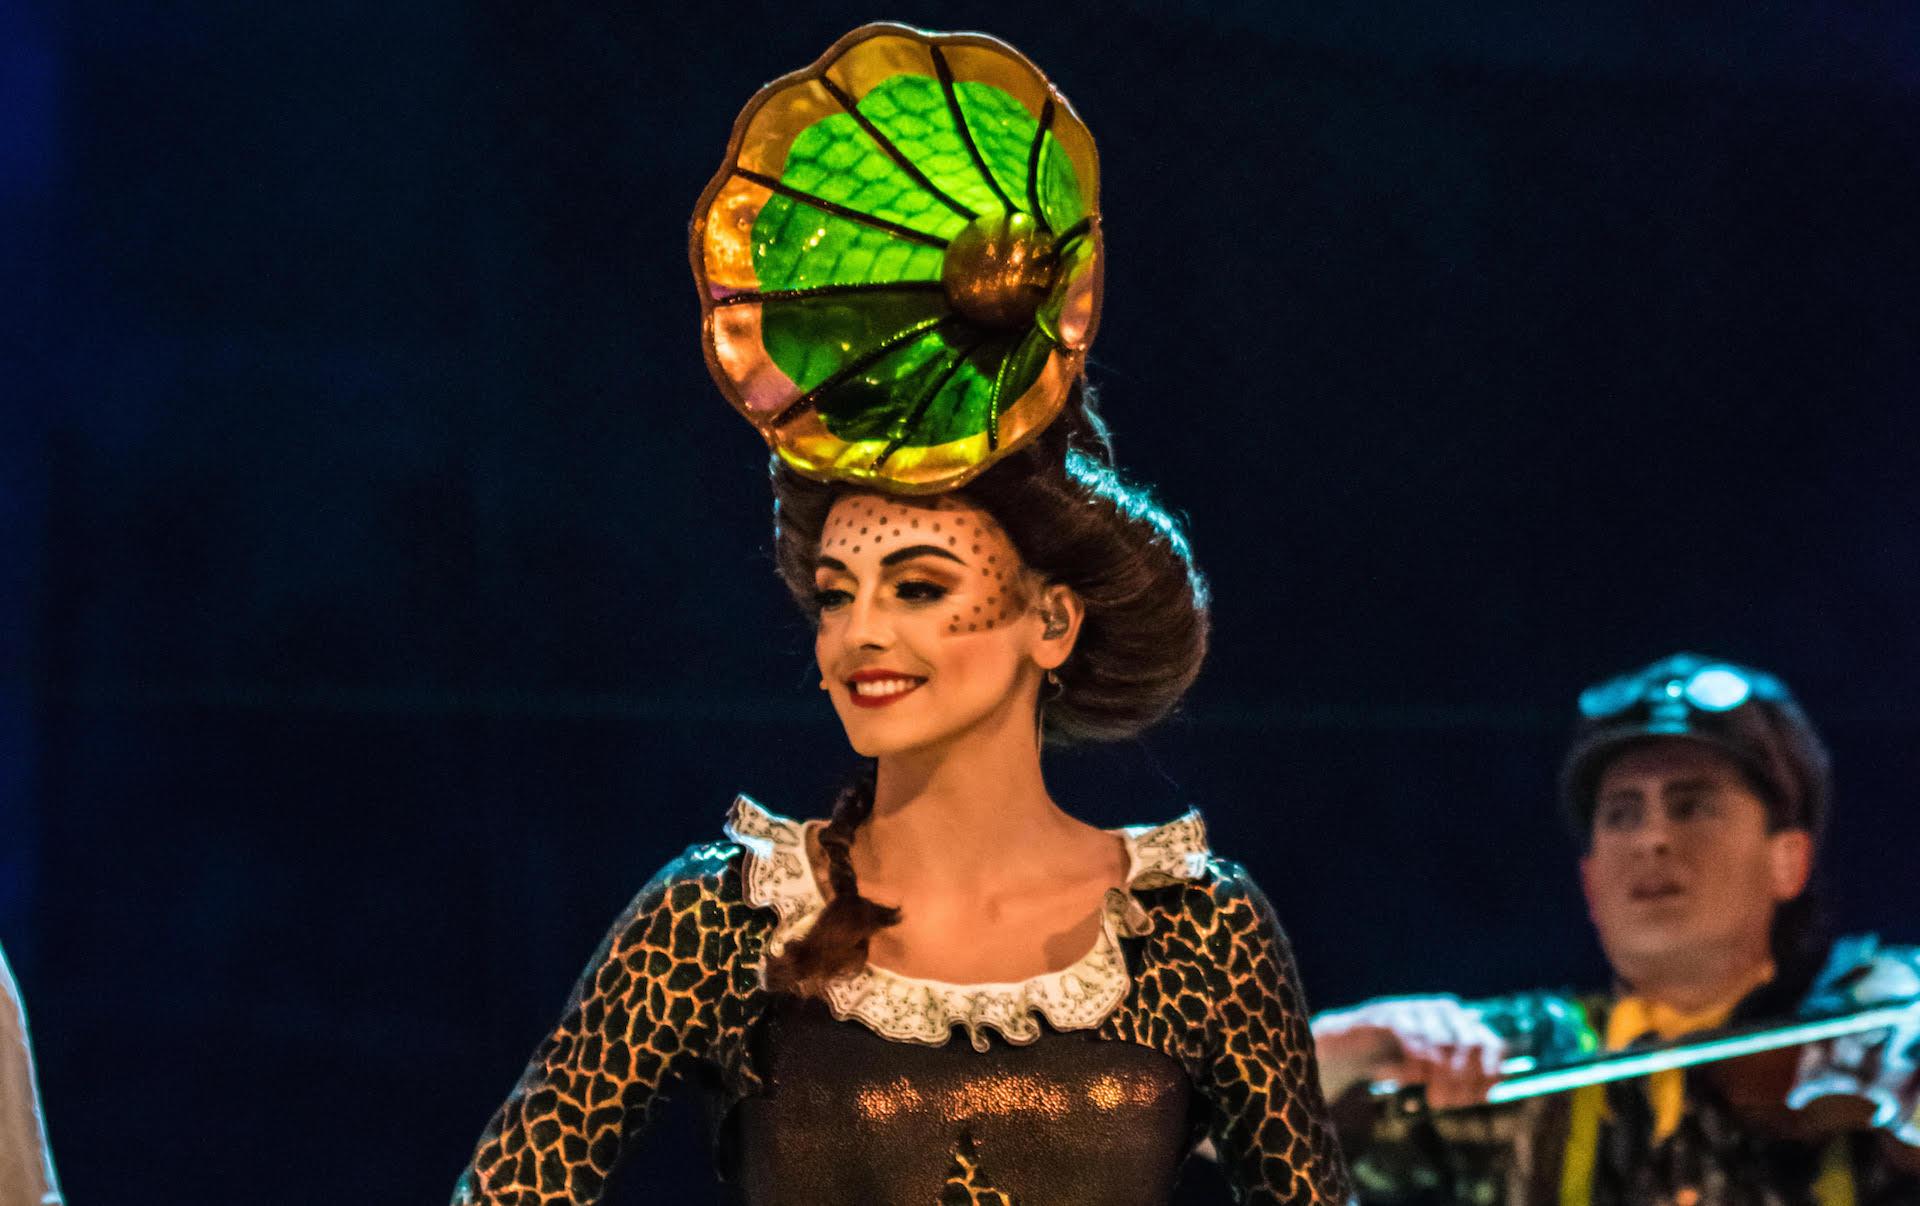 Cirque Du Soleil vocalist Eirini Tornesaki